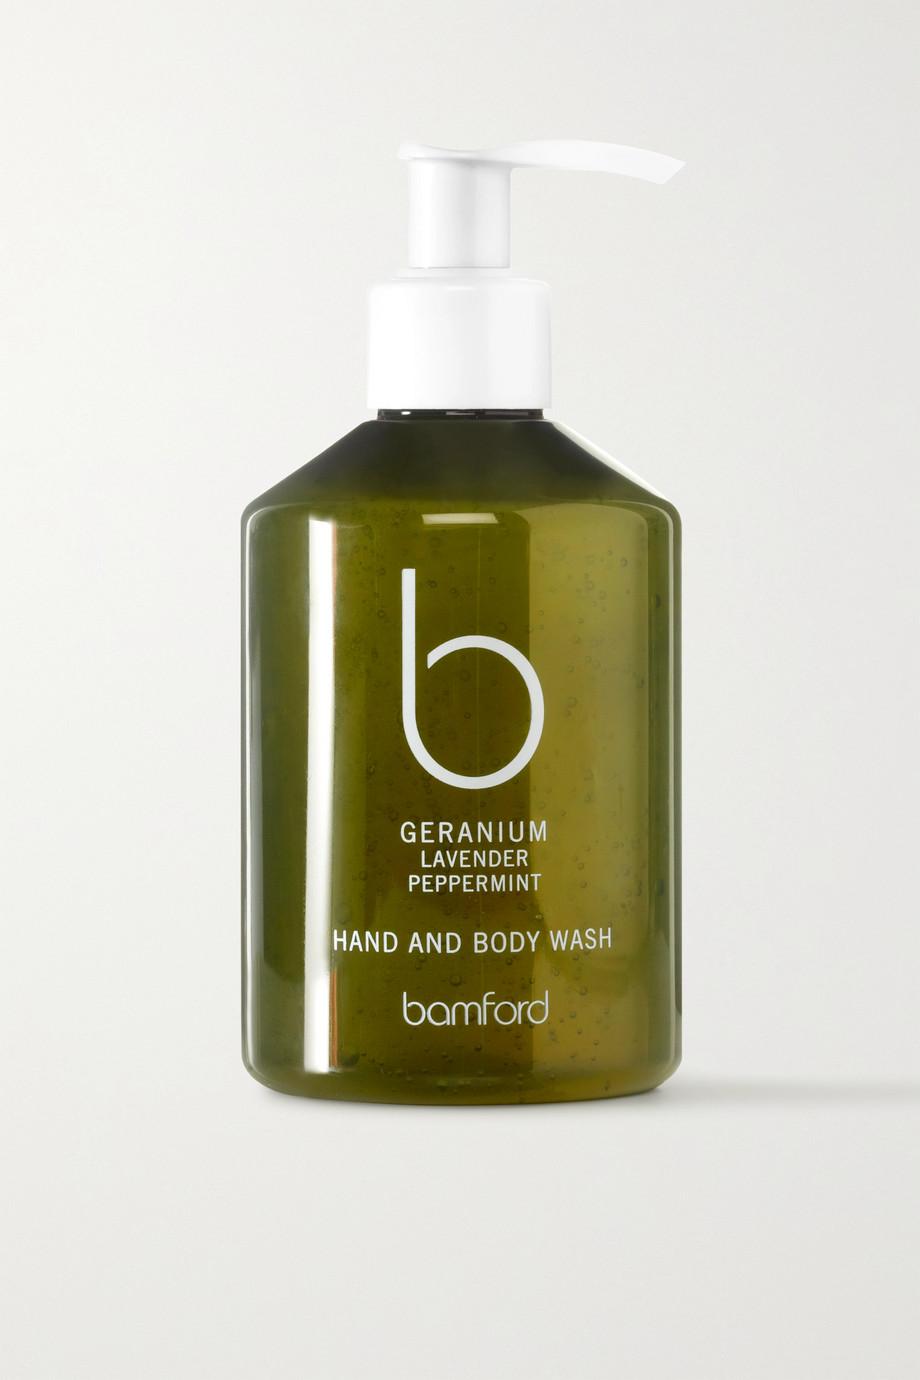 Bamford Geranium Hand & Body Wash, 250ml – Waschgel